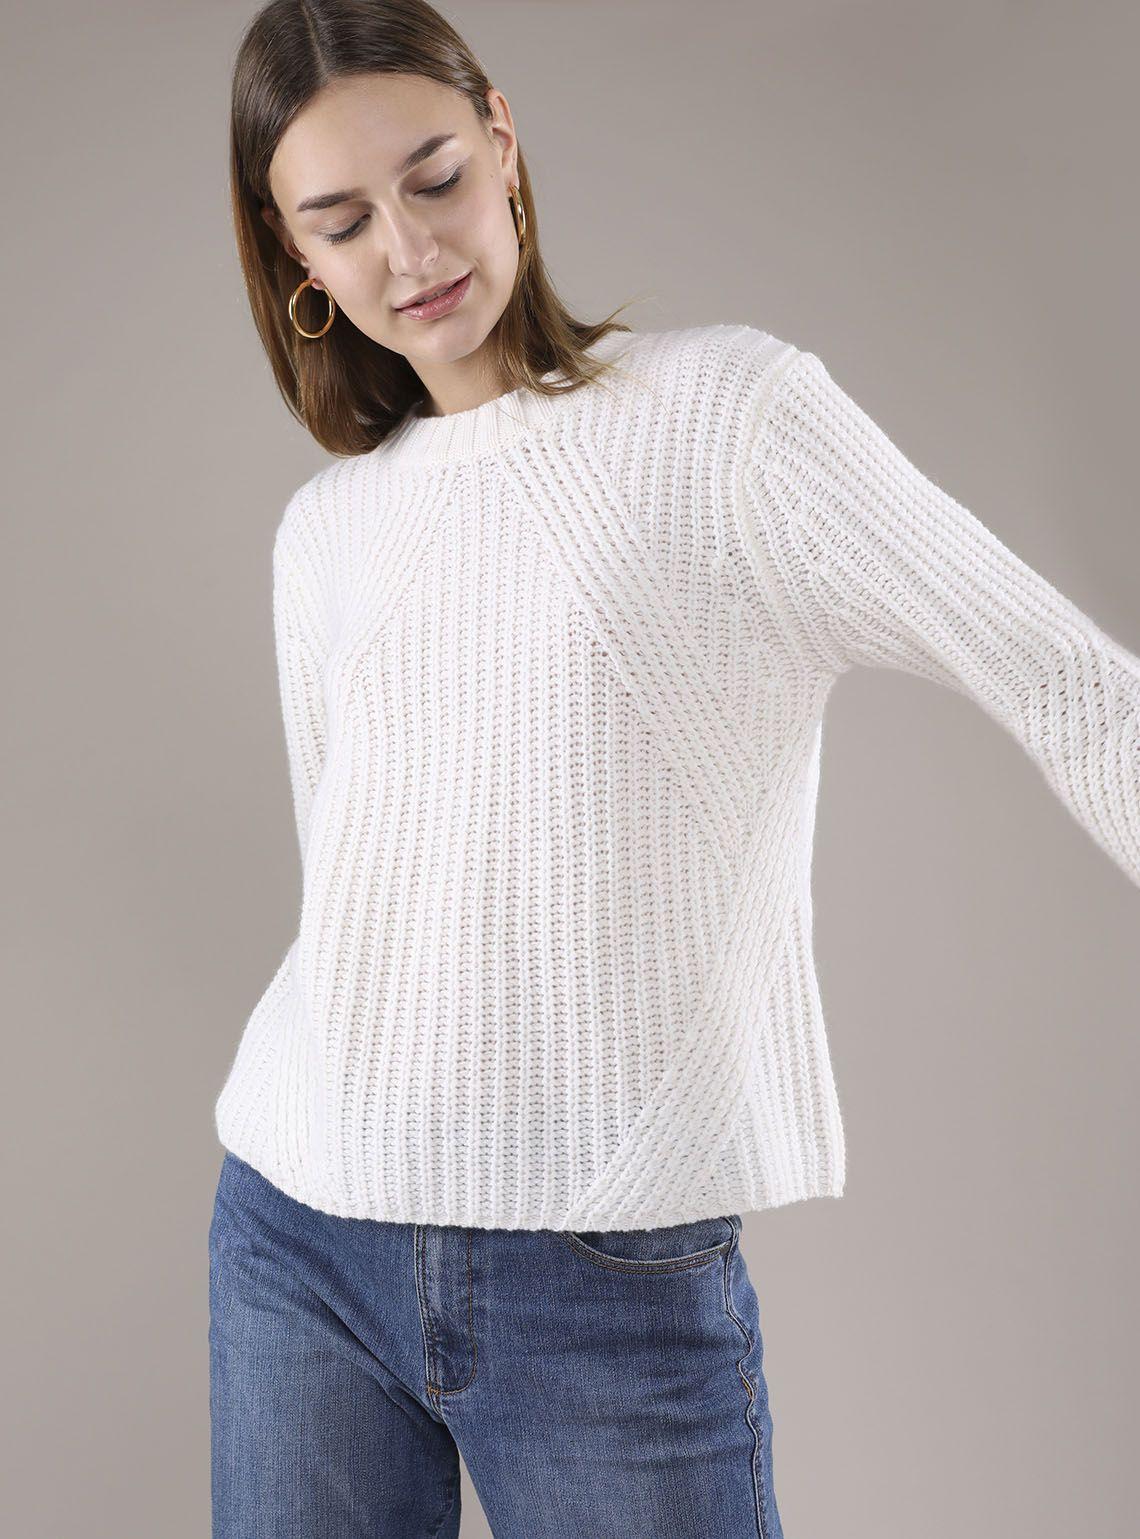 4bd52f32944dca Women s Cashmere Textured Sweater